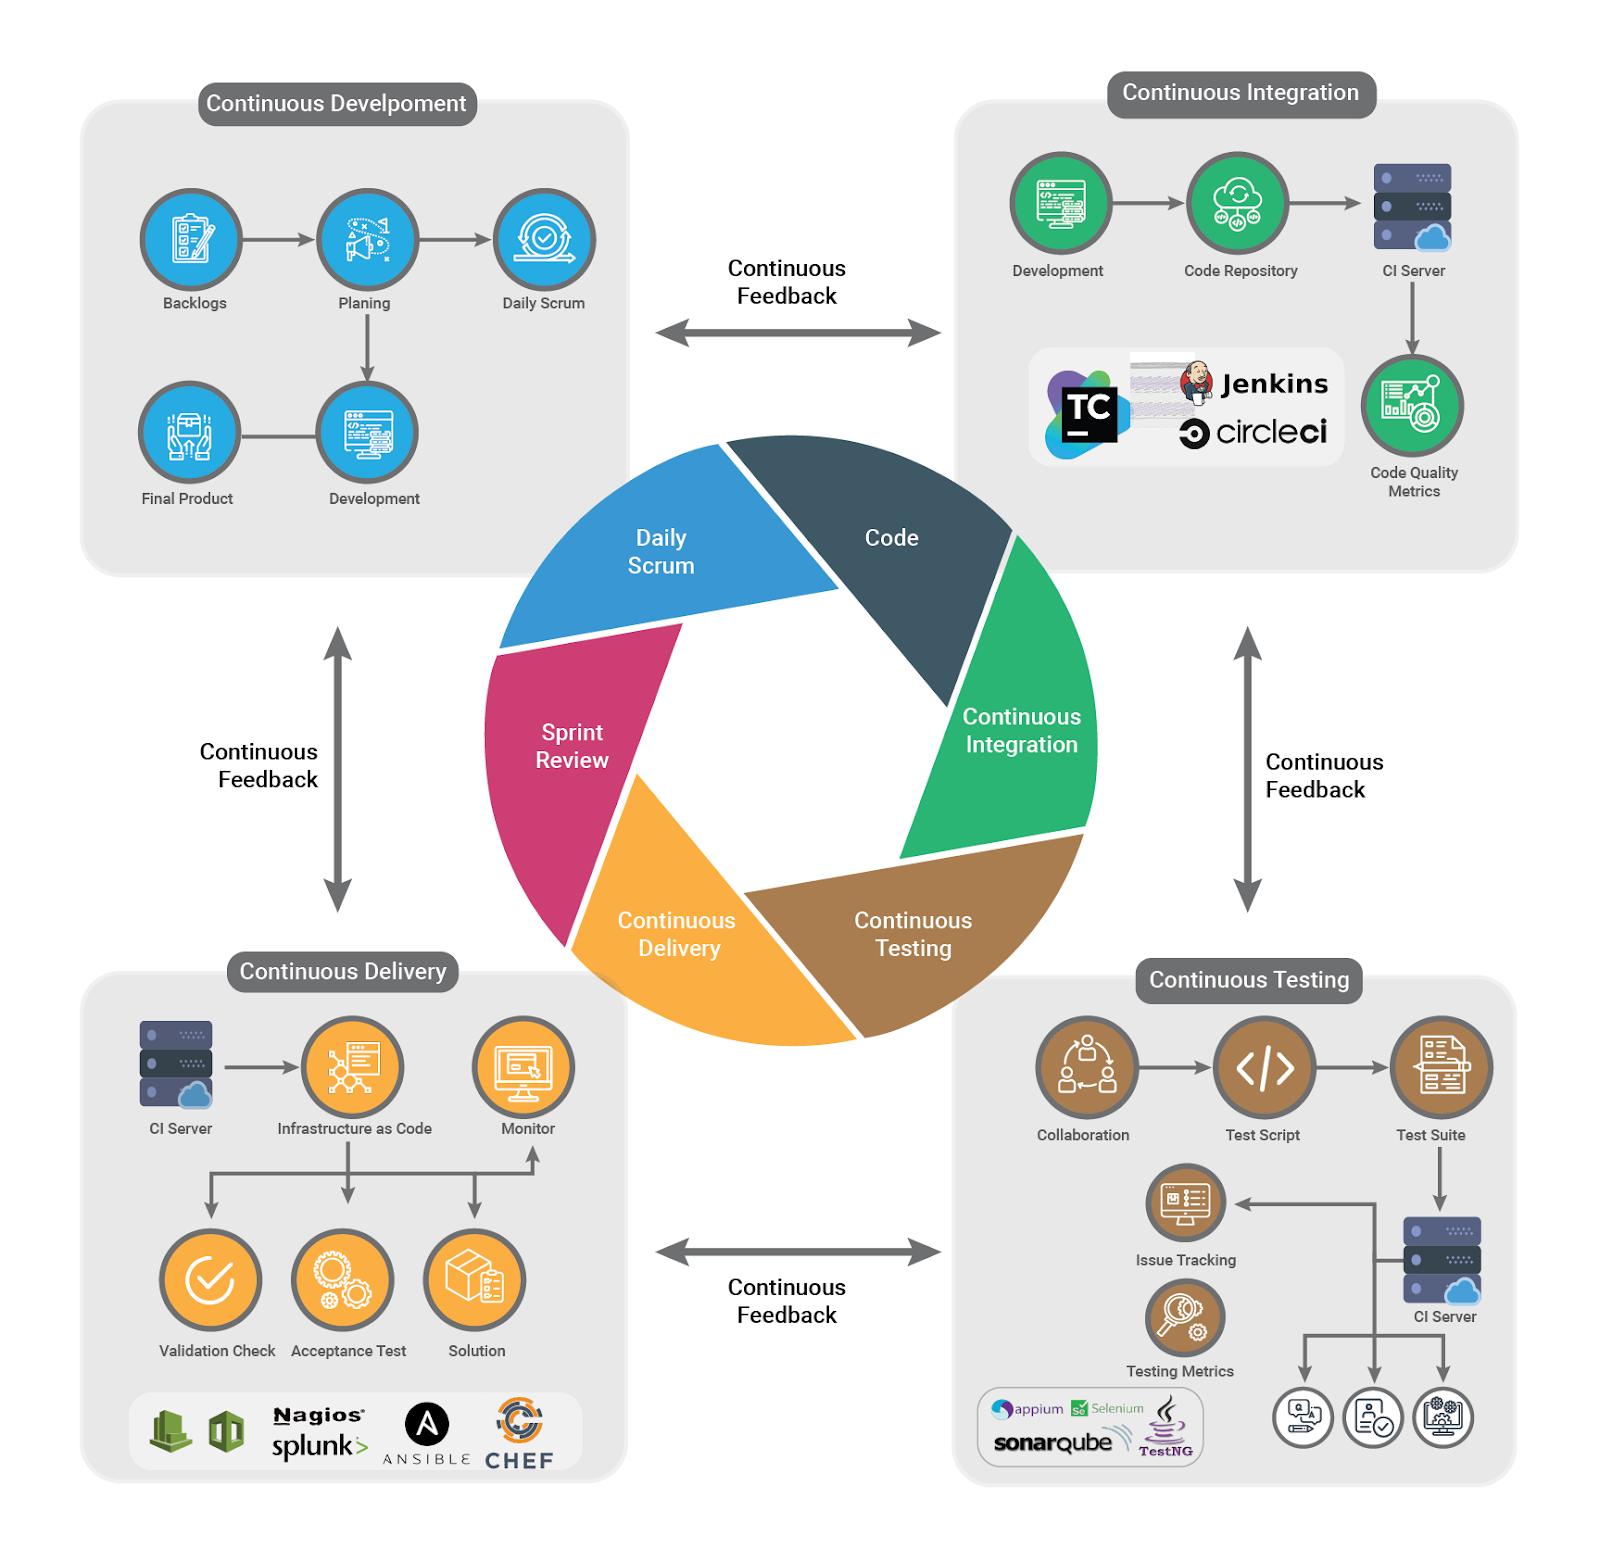 C:\Users\Prima.Saraiya\Downloads\final devops blog diagram [Recovered]-01-01.png